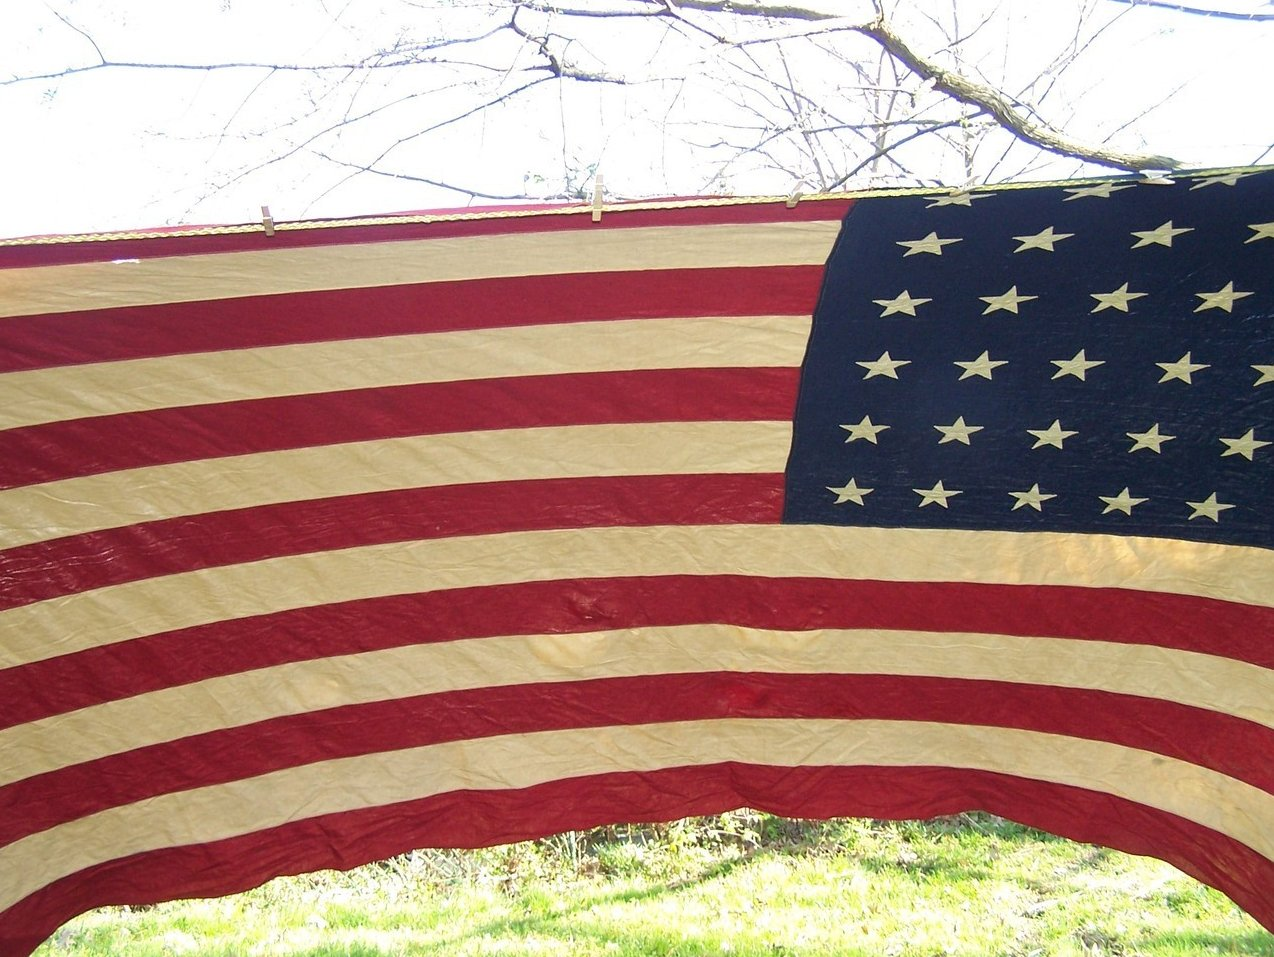 Image 4 of WWII Era 48 Star American Flag Sewn Cloth, Garrison Size